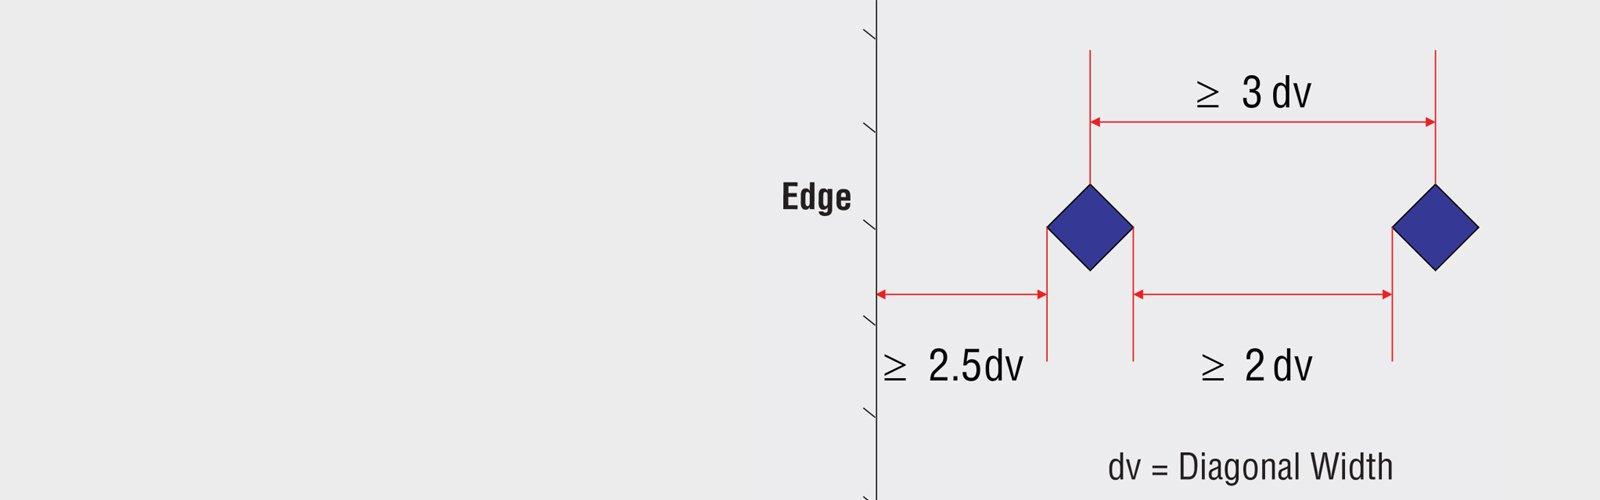 Hardness Testing Knowledge Bridge Labeled Parts Diagram Indent Spacing